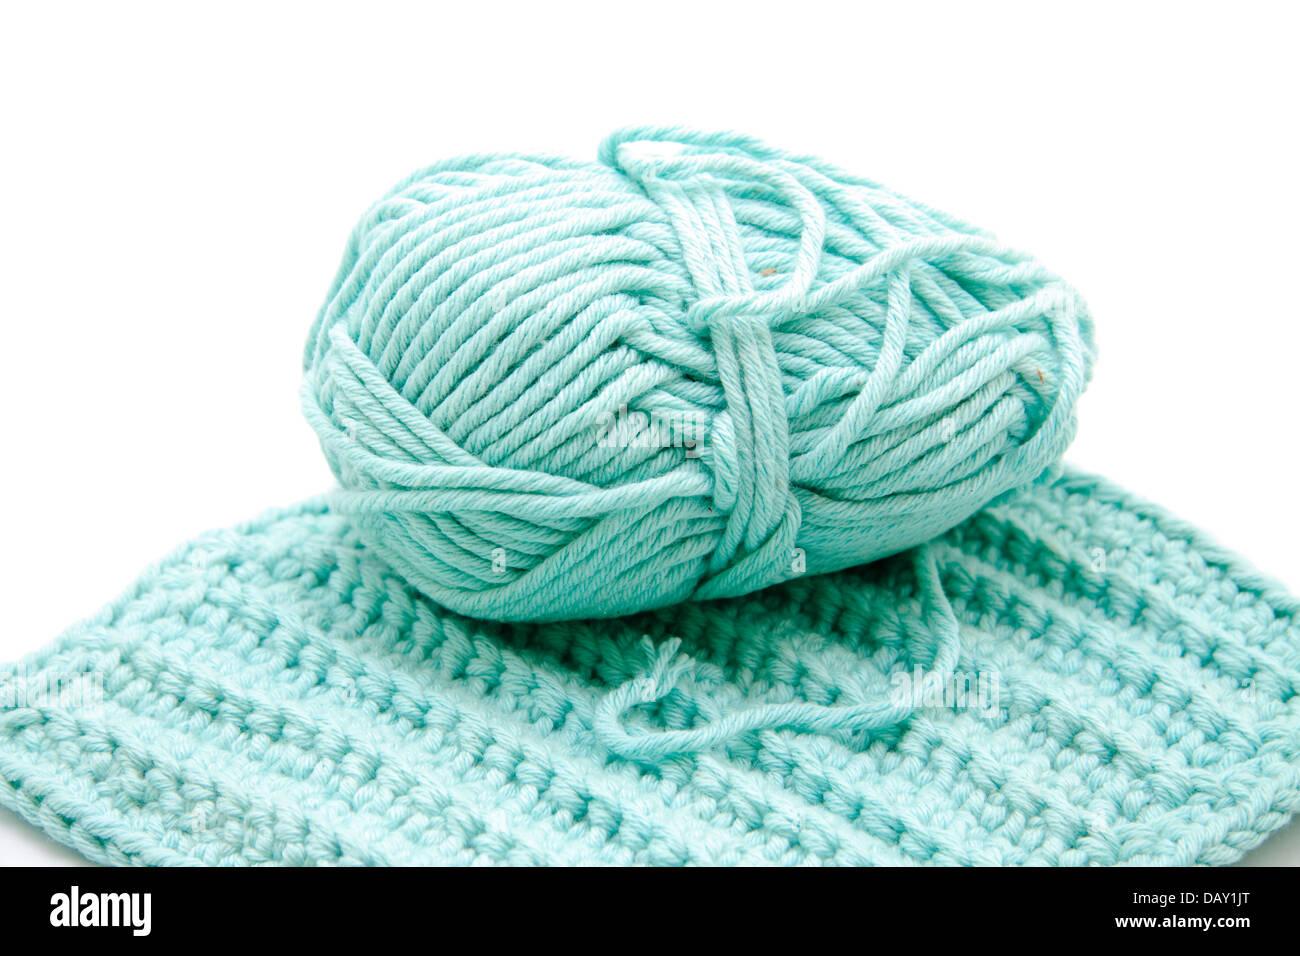 Crochet wool - Stock Image